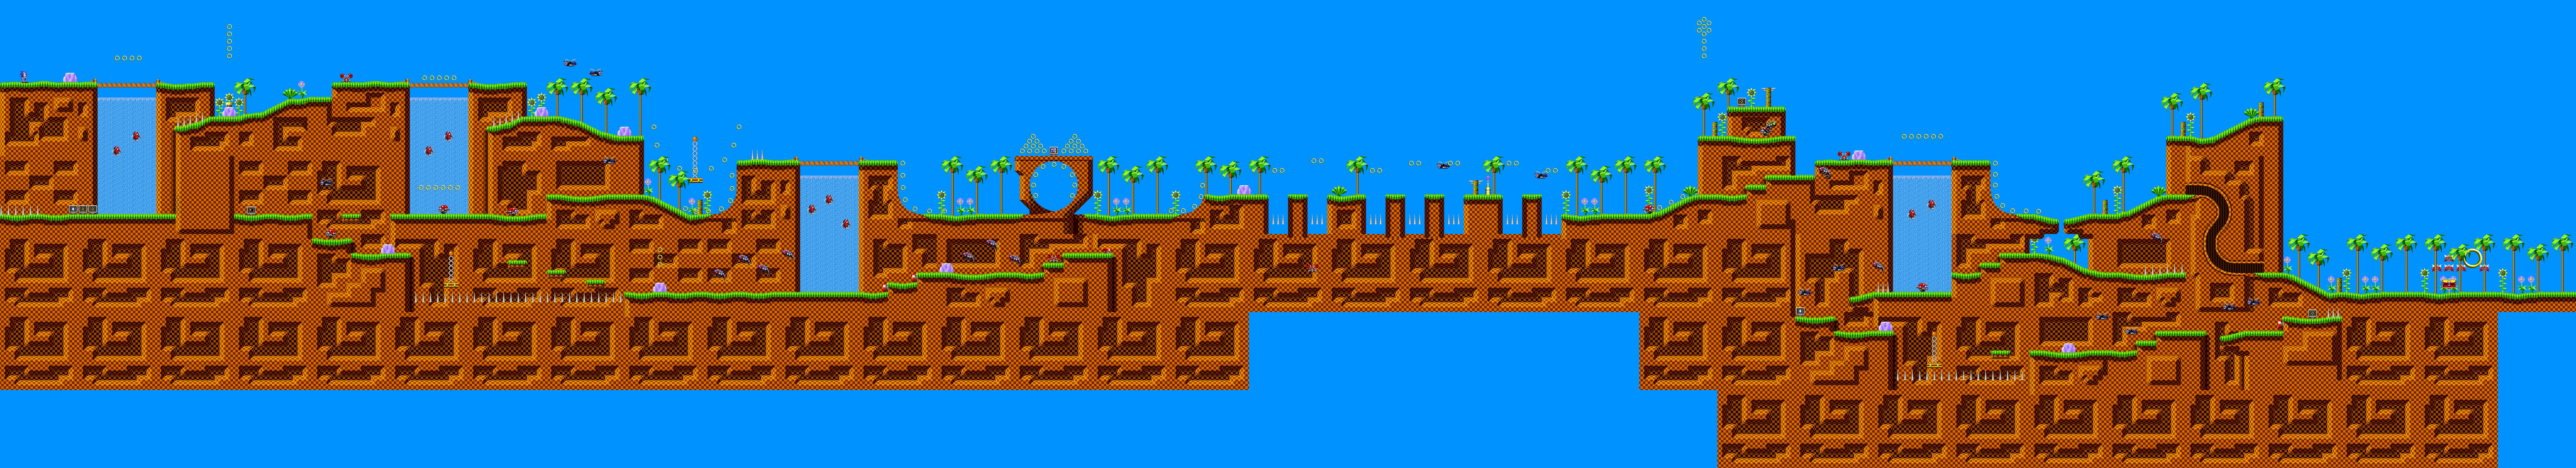 Green Hill Zone Sonic The Hedgehog 16 Bit Sonic Retro